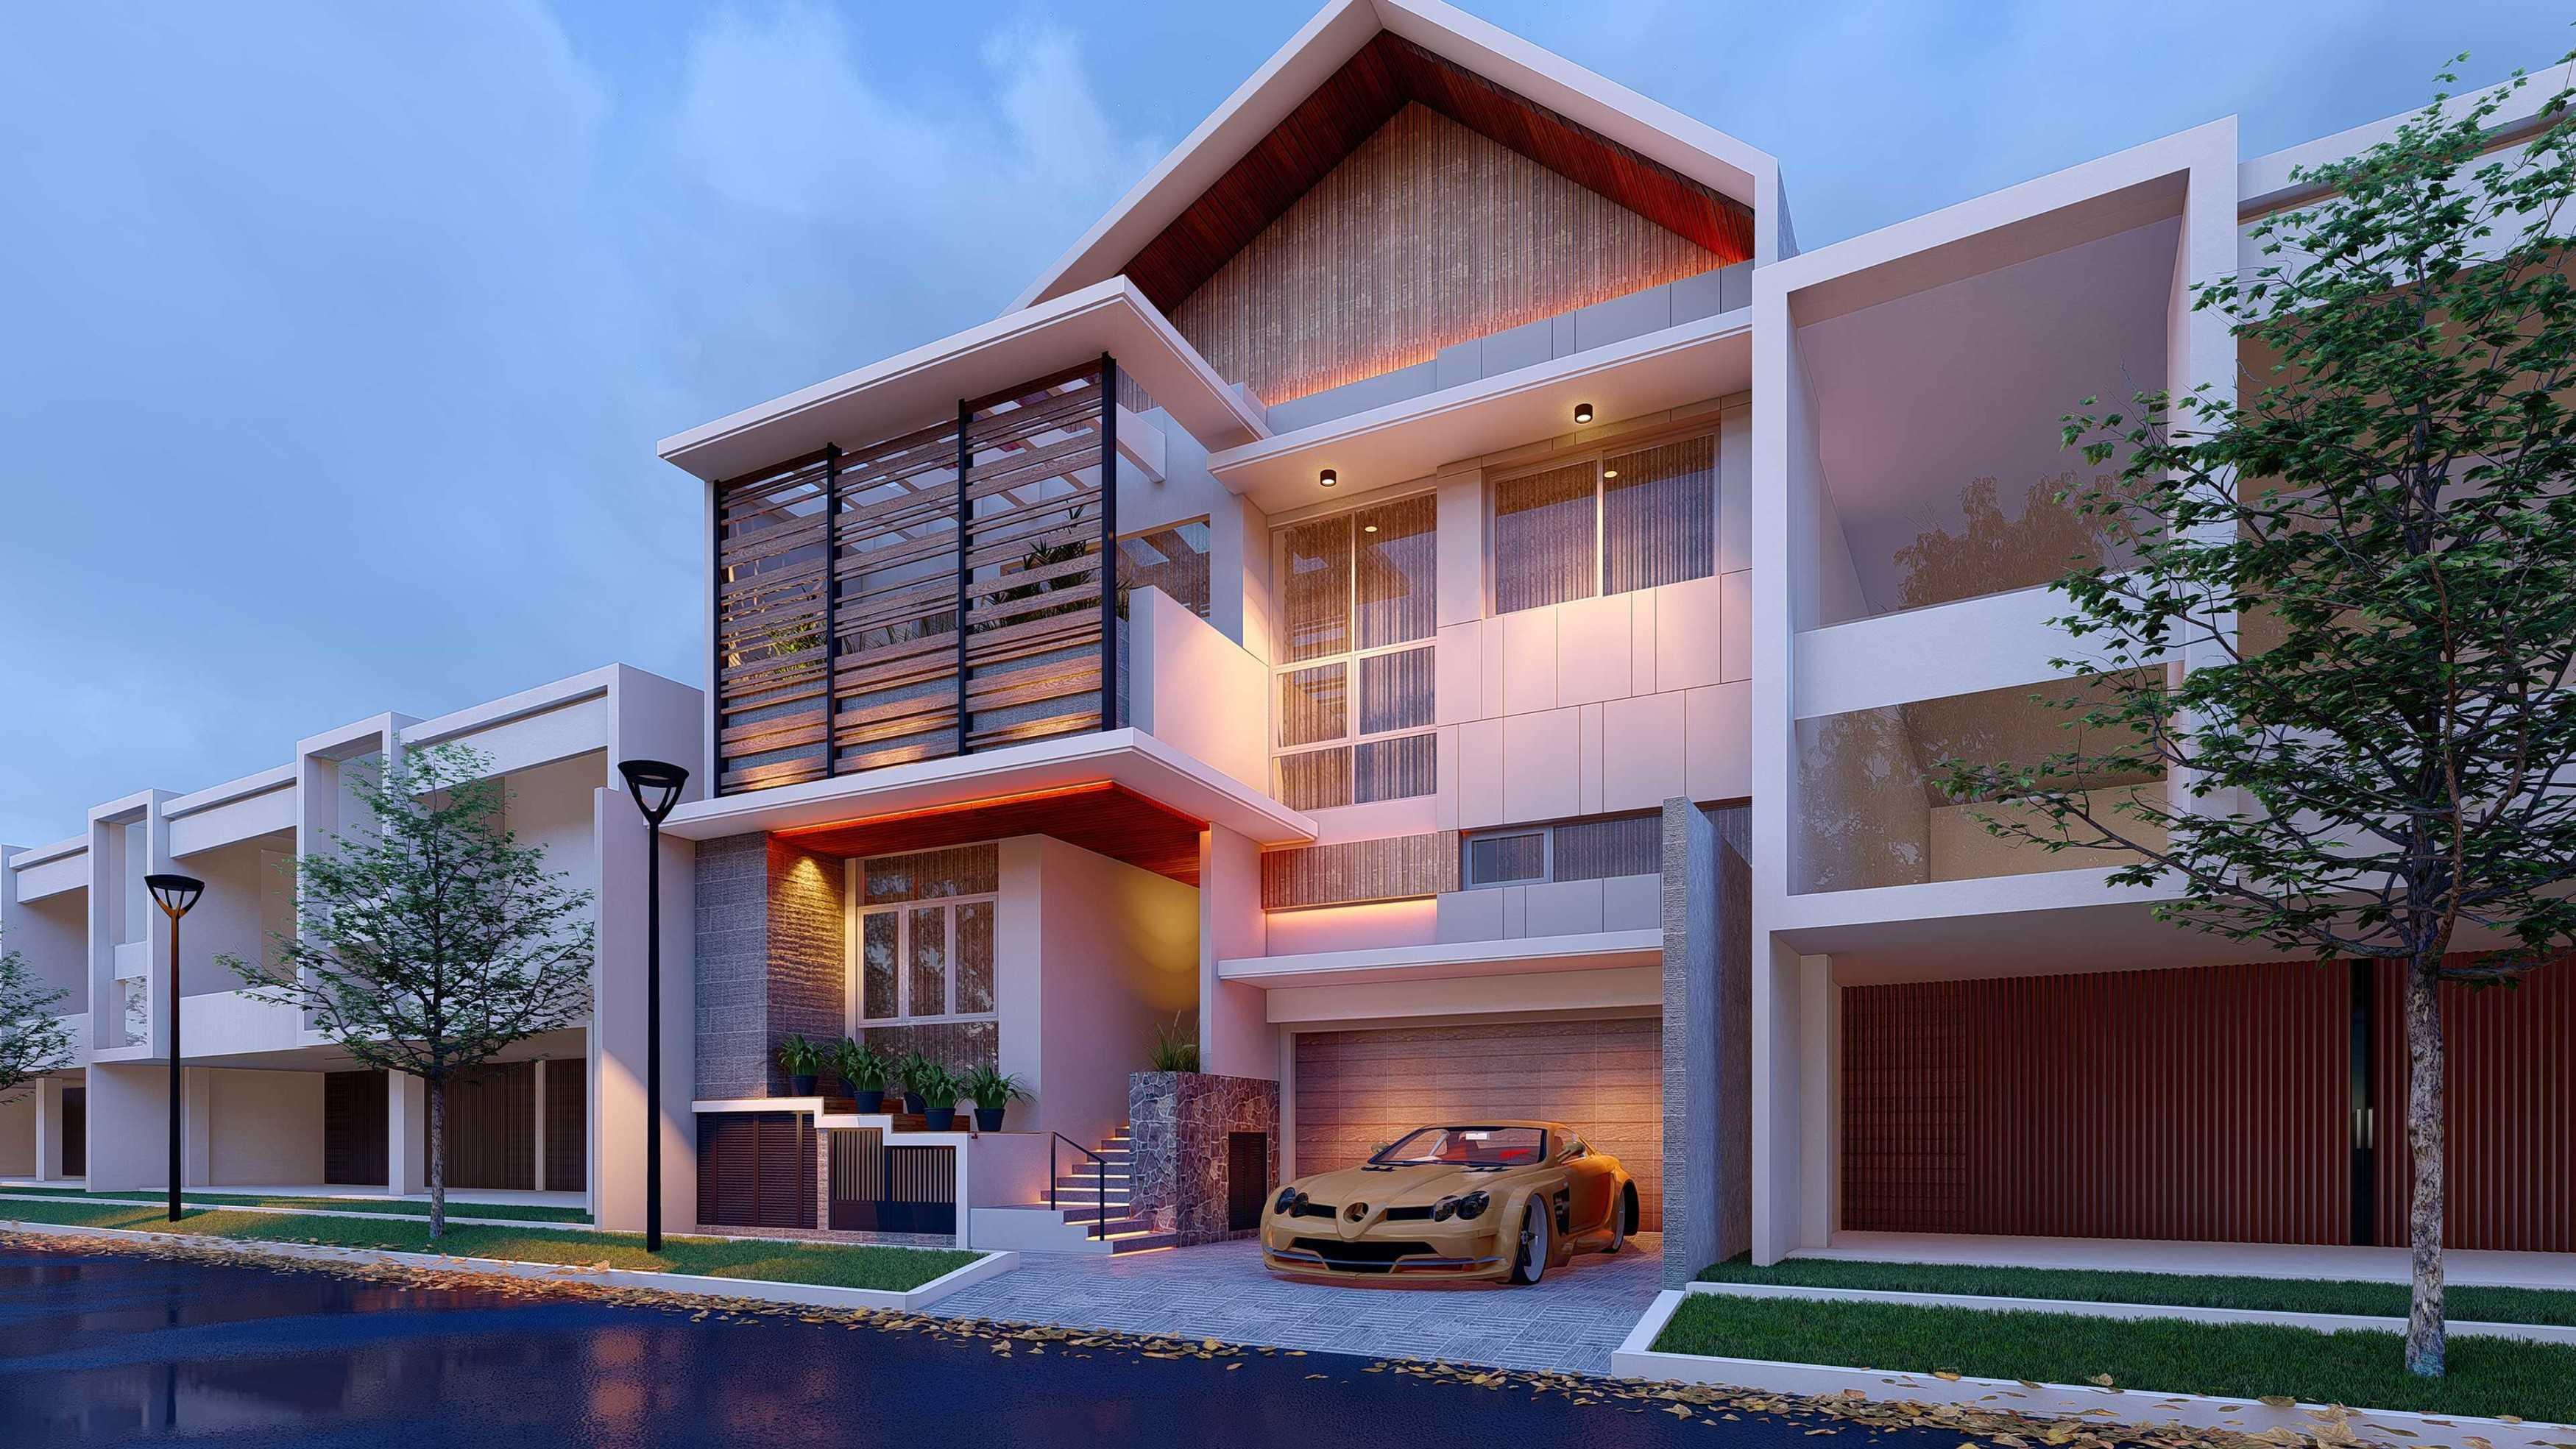 Conarch Studio Mr. F House Surakarta, Kota Surakarta, Jawa Tengah, Indonesia Surakarta, Kota Surakarta, Jawa Tengah, Indonesia Conarch-Bangun-Sejahtera-Mr-F-House   80513